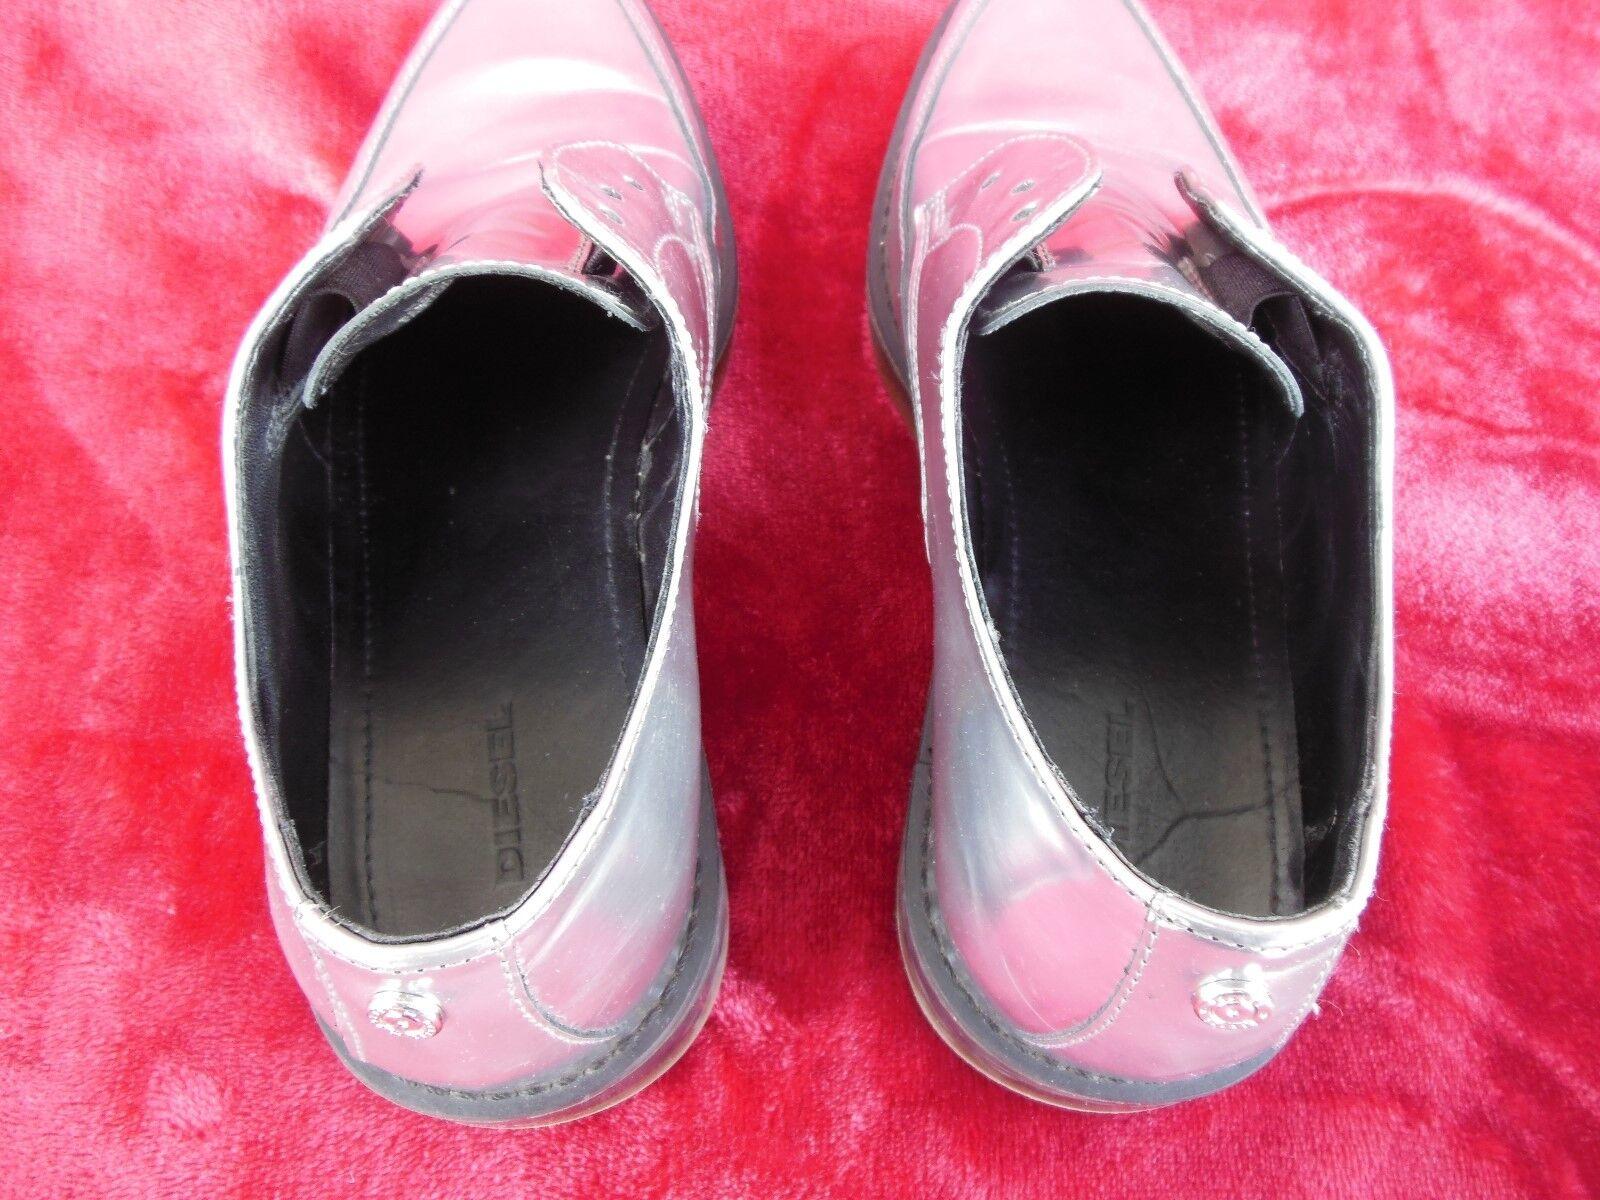 Diesel Damens UK 39 Schuhe US 8.5 Silver Point Toe Schuhe 39 Oxford 577bd0